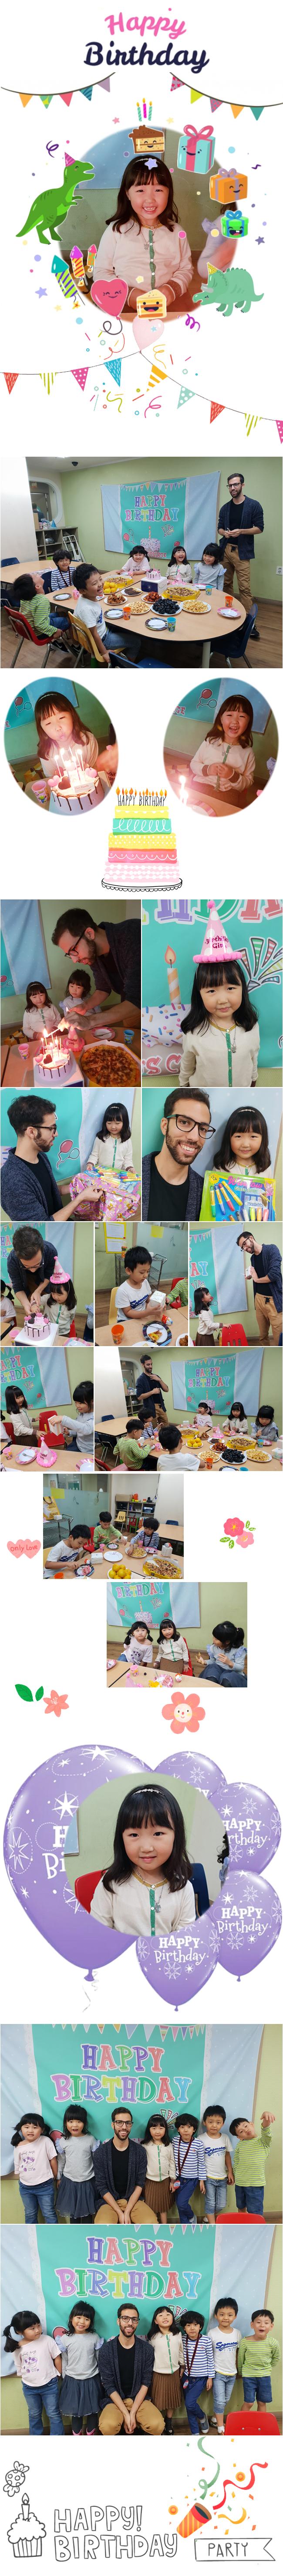 birthday홈페이지용  copy.jpg